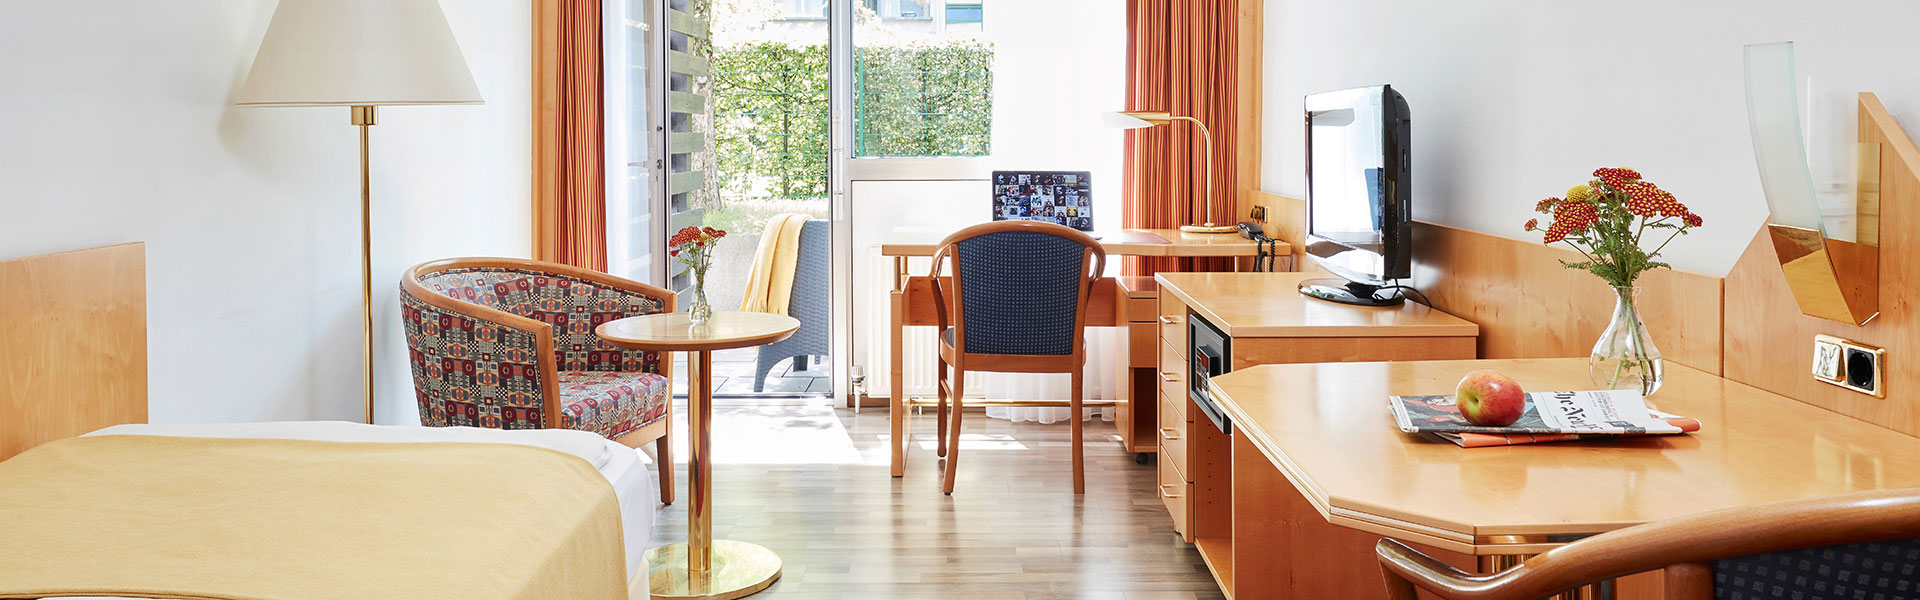 Living Hotel am Deutschen Museum Muenchen Apartments